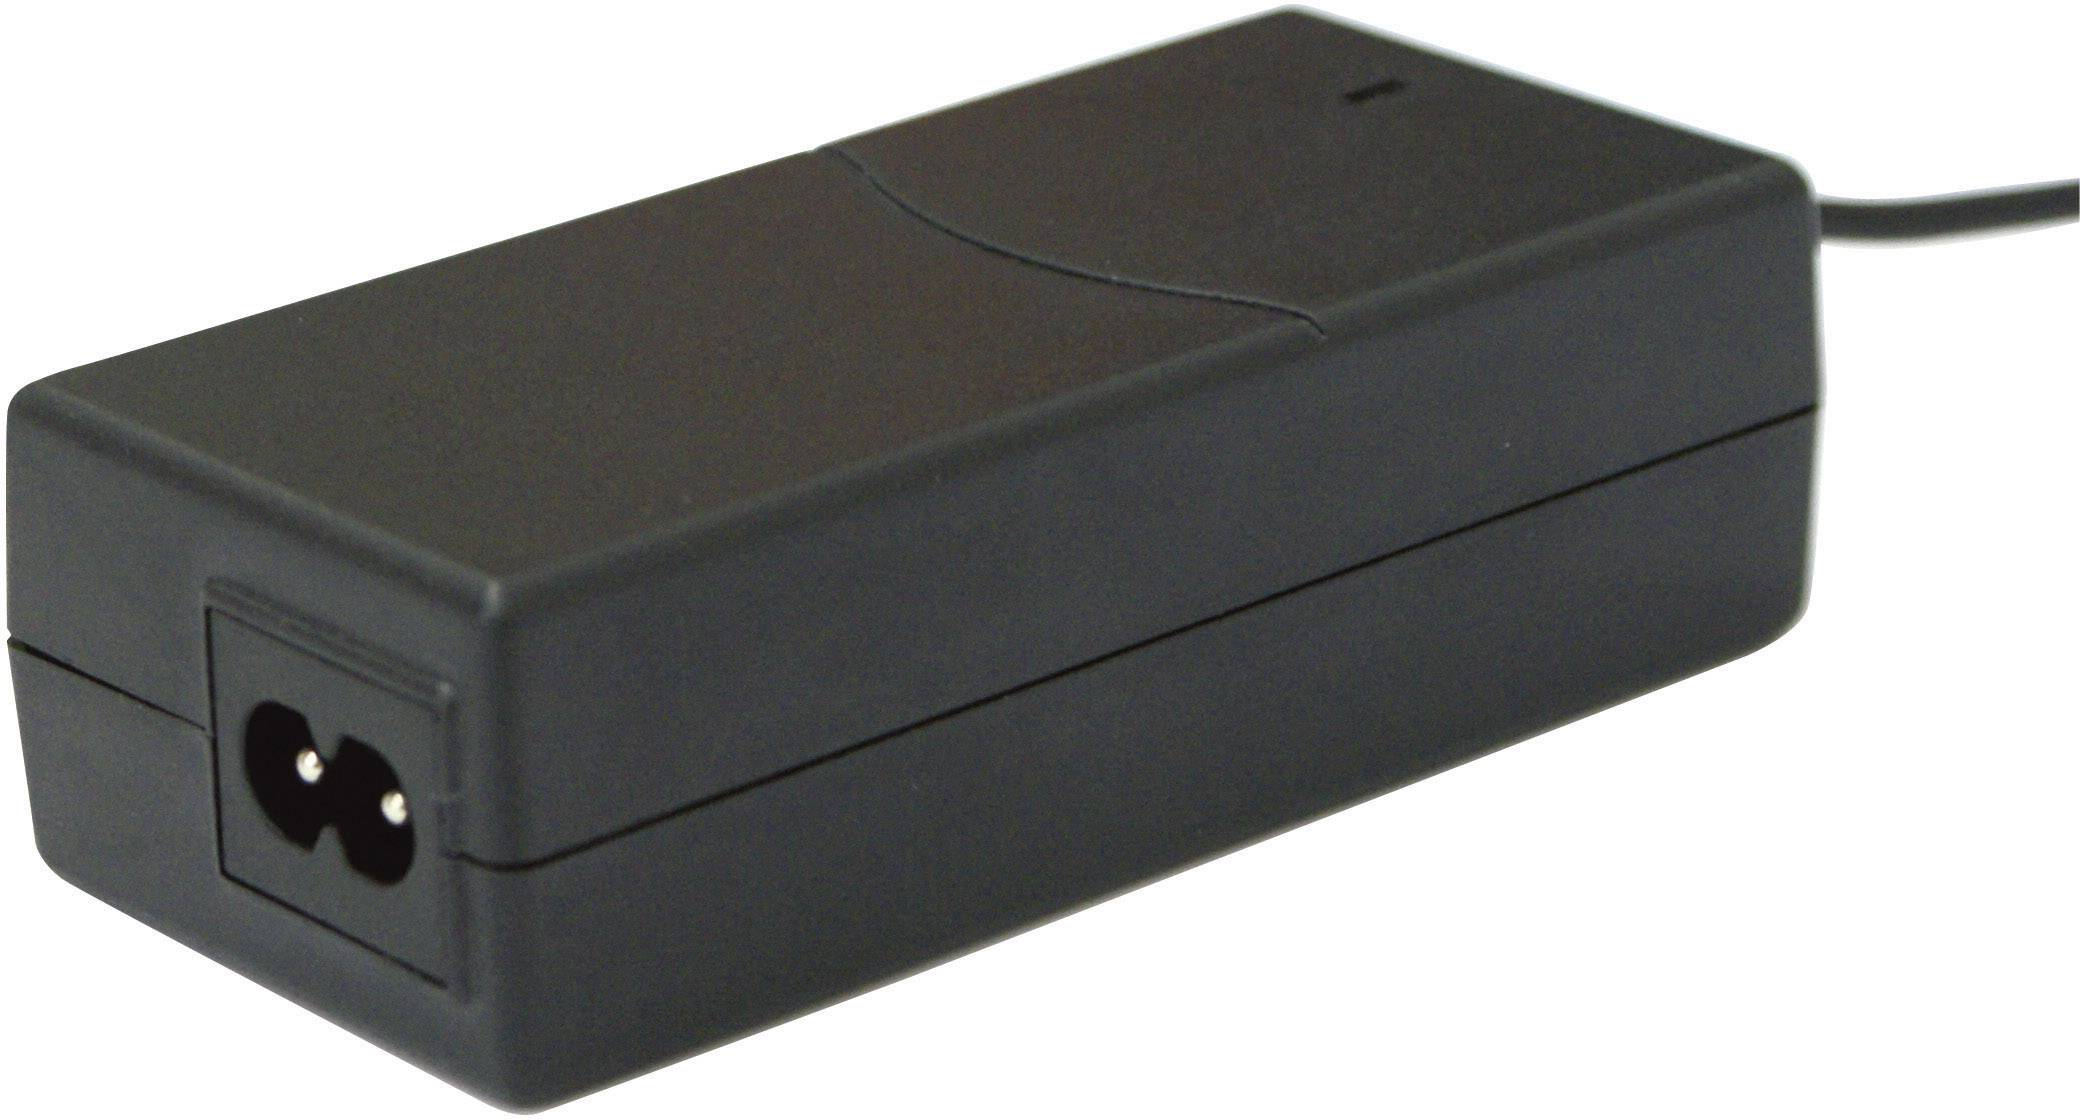 Síťový adaptér Egston BI60-120500-E2, 12 VDC, 60 W